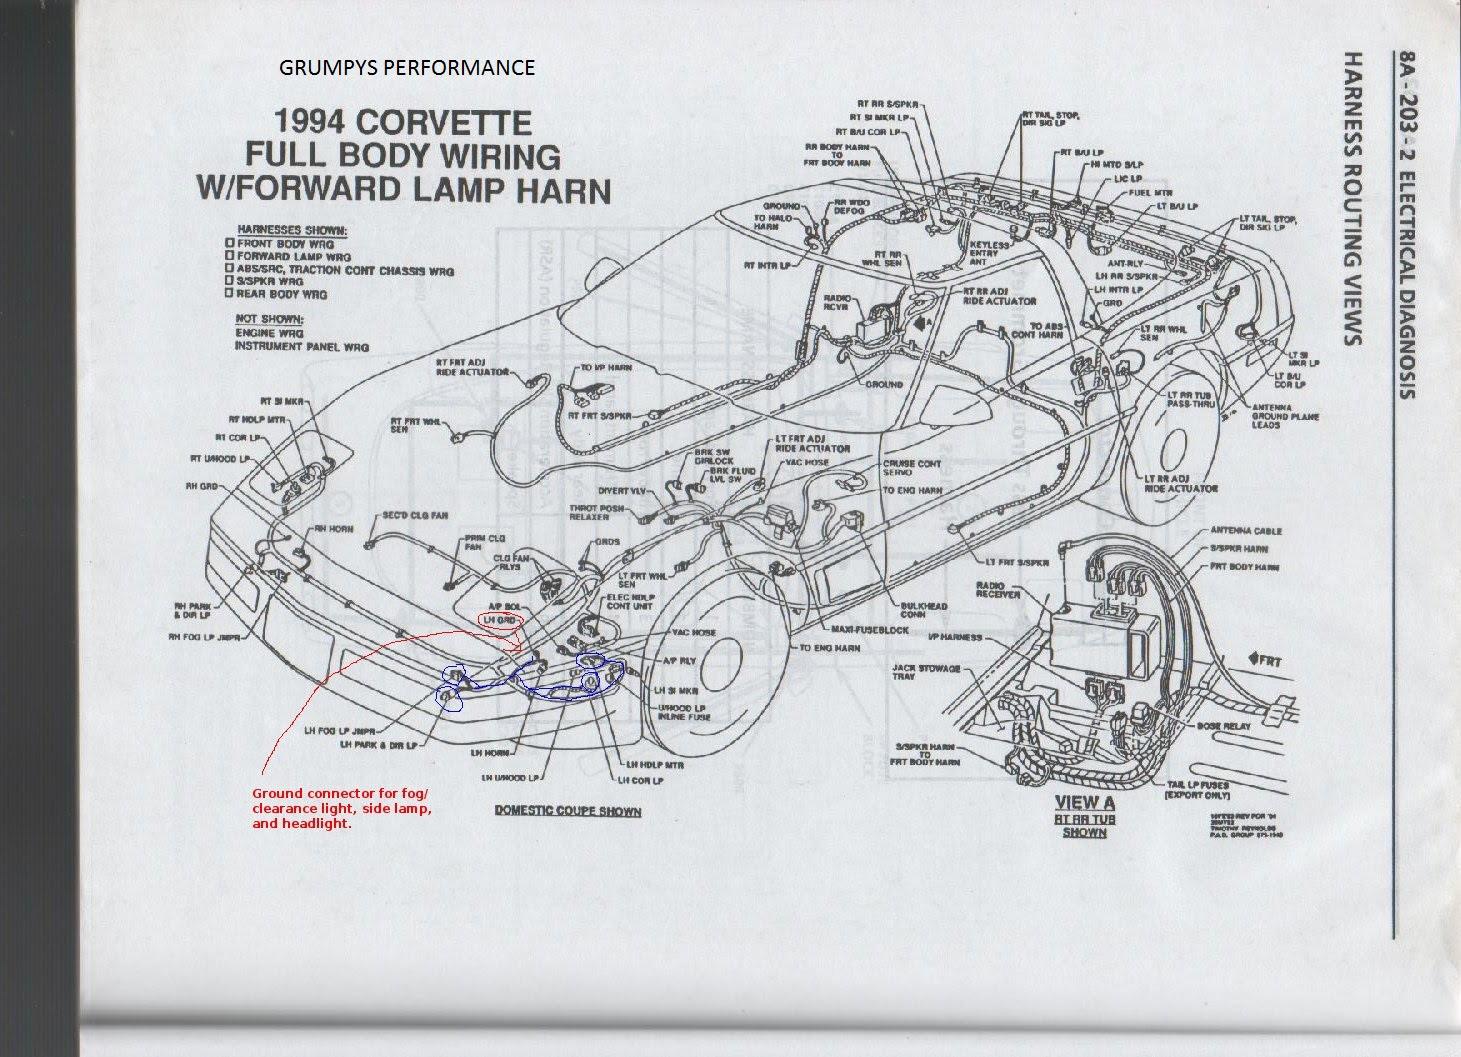 2001 Corvette Headlight Motor Wiring Diagram Vauxhall Engine Diagrams Wiring Diagram Schematics